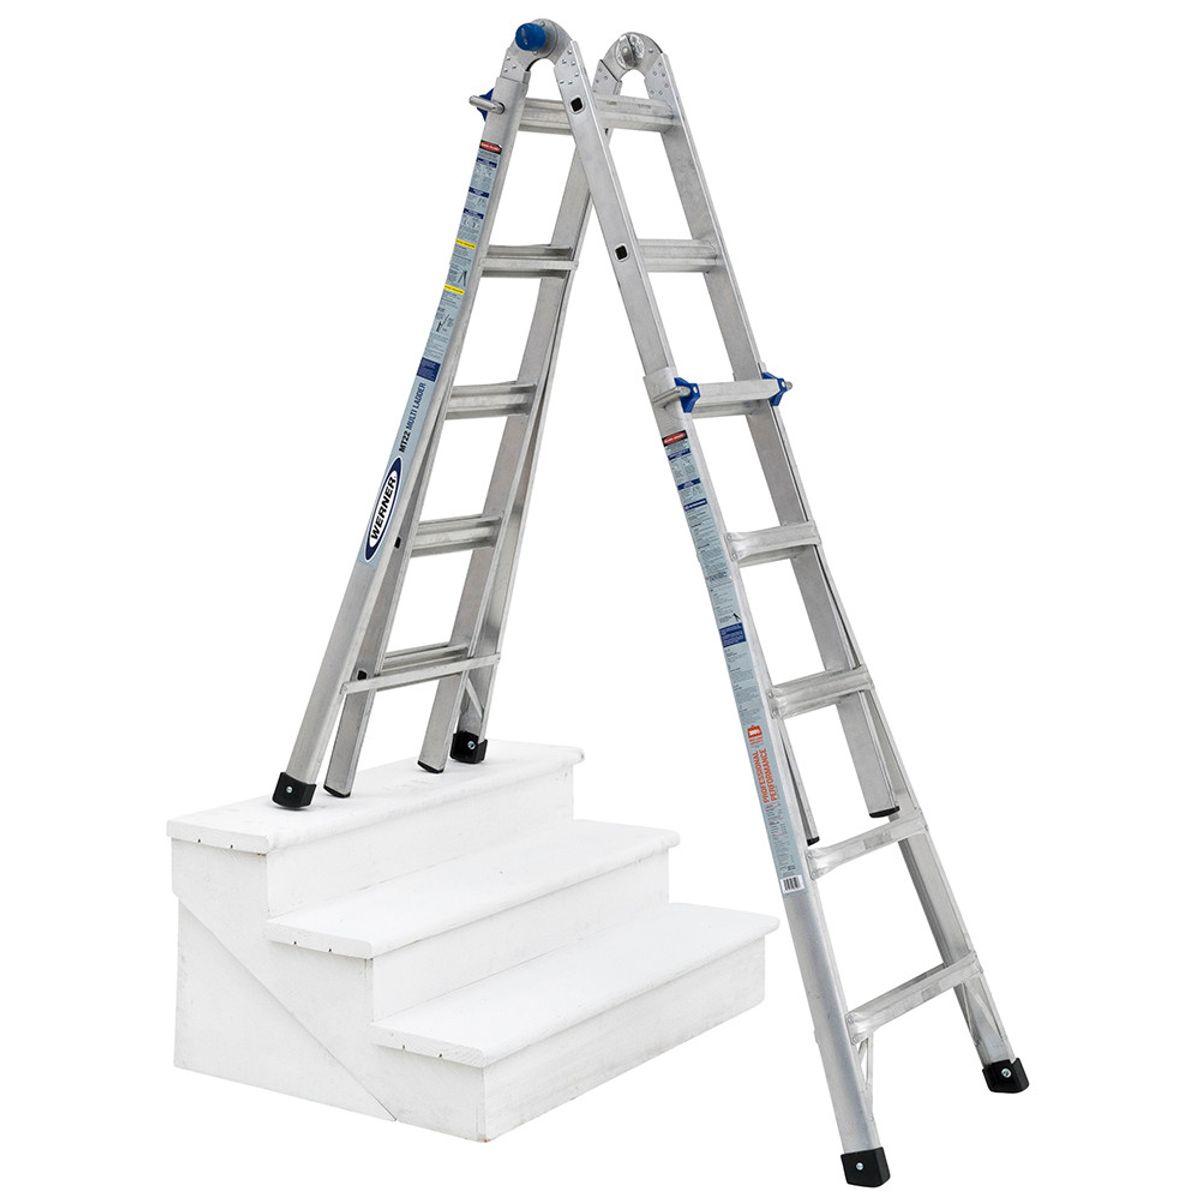 Mt 22 Multi Purpose Ladders Werner Us